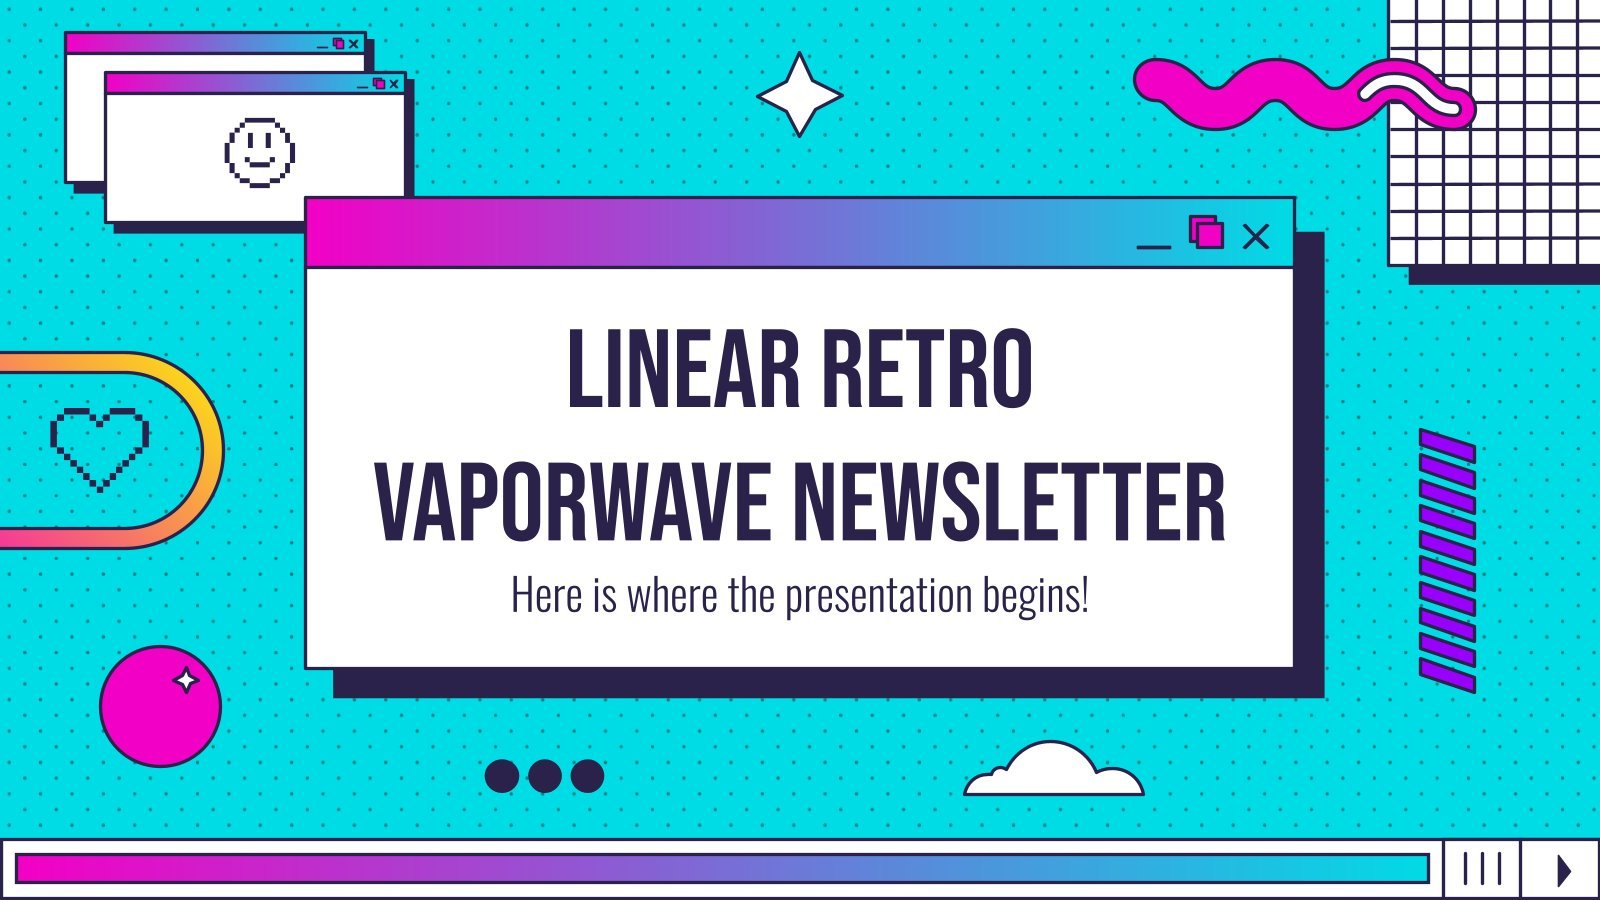 Linear Retro Vaporwave Newsletter presentation template